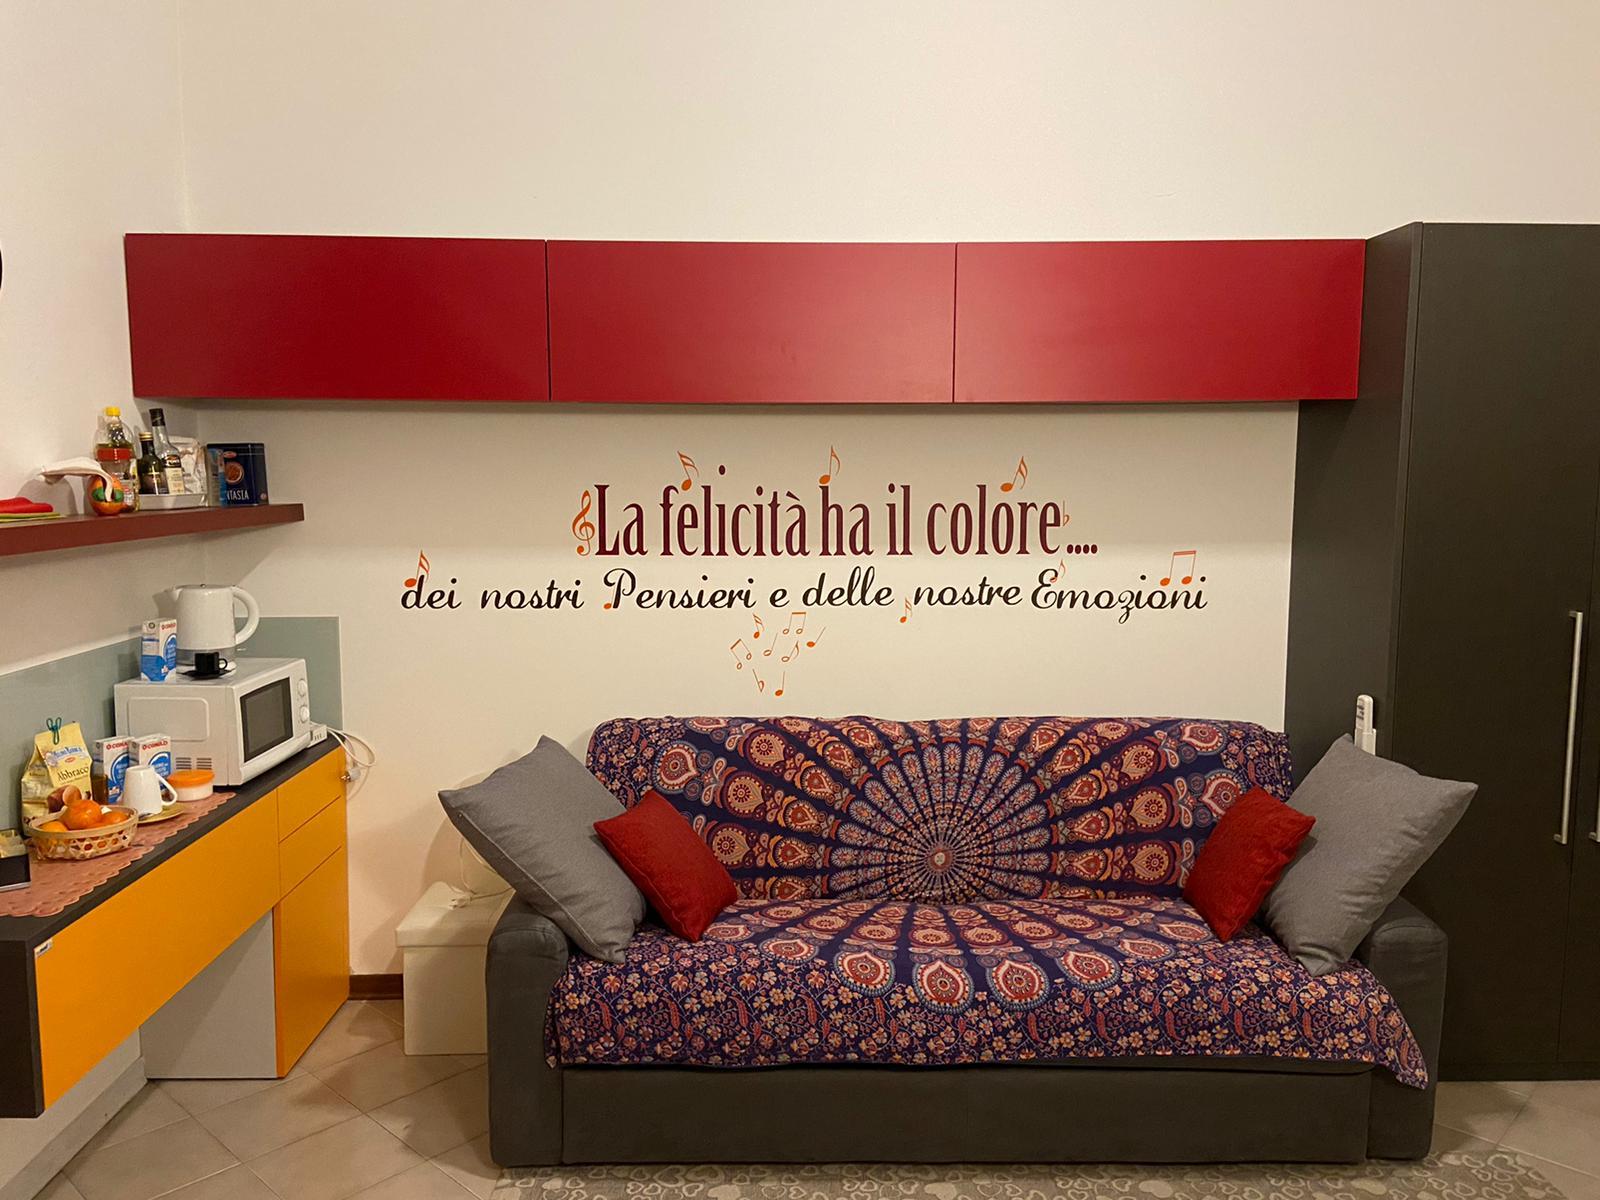 https://www.in-lombardia.it/sites/default/files/accomodation/gallery/107356/44700/cosy-studio-cremona_1.jpg